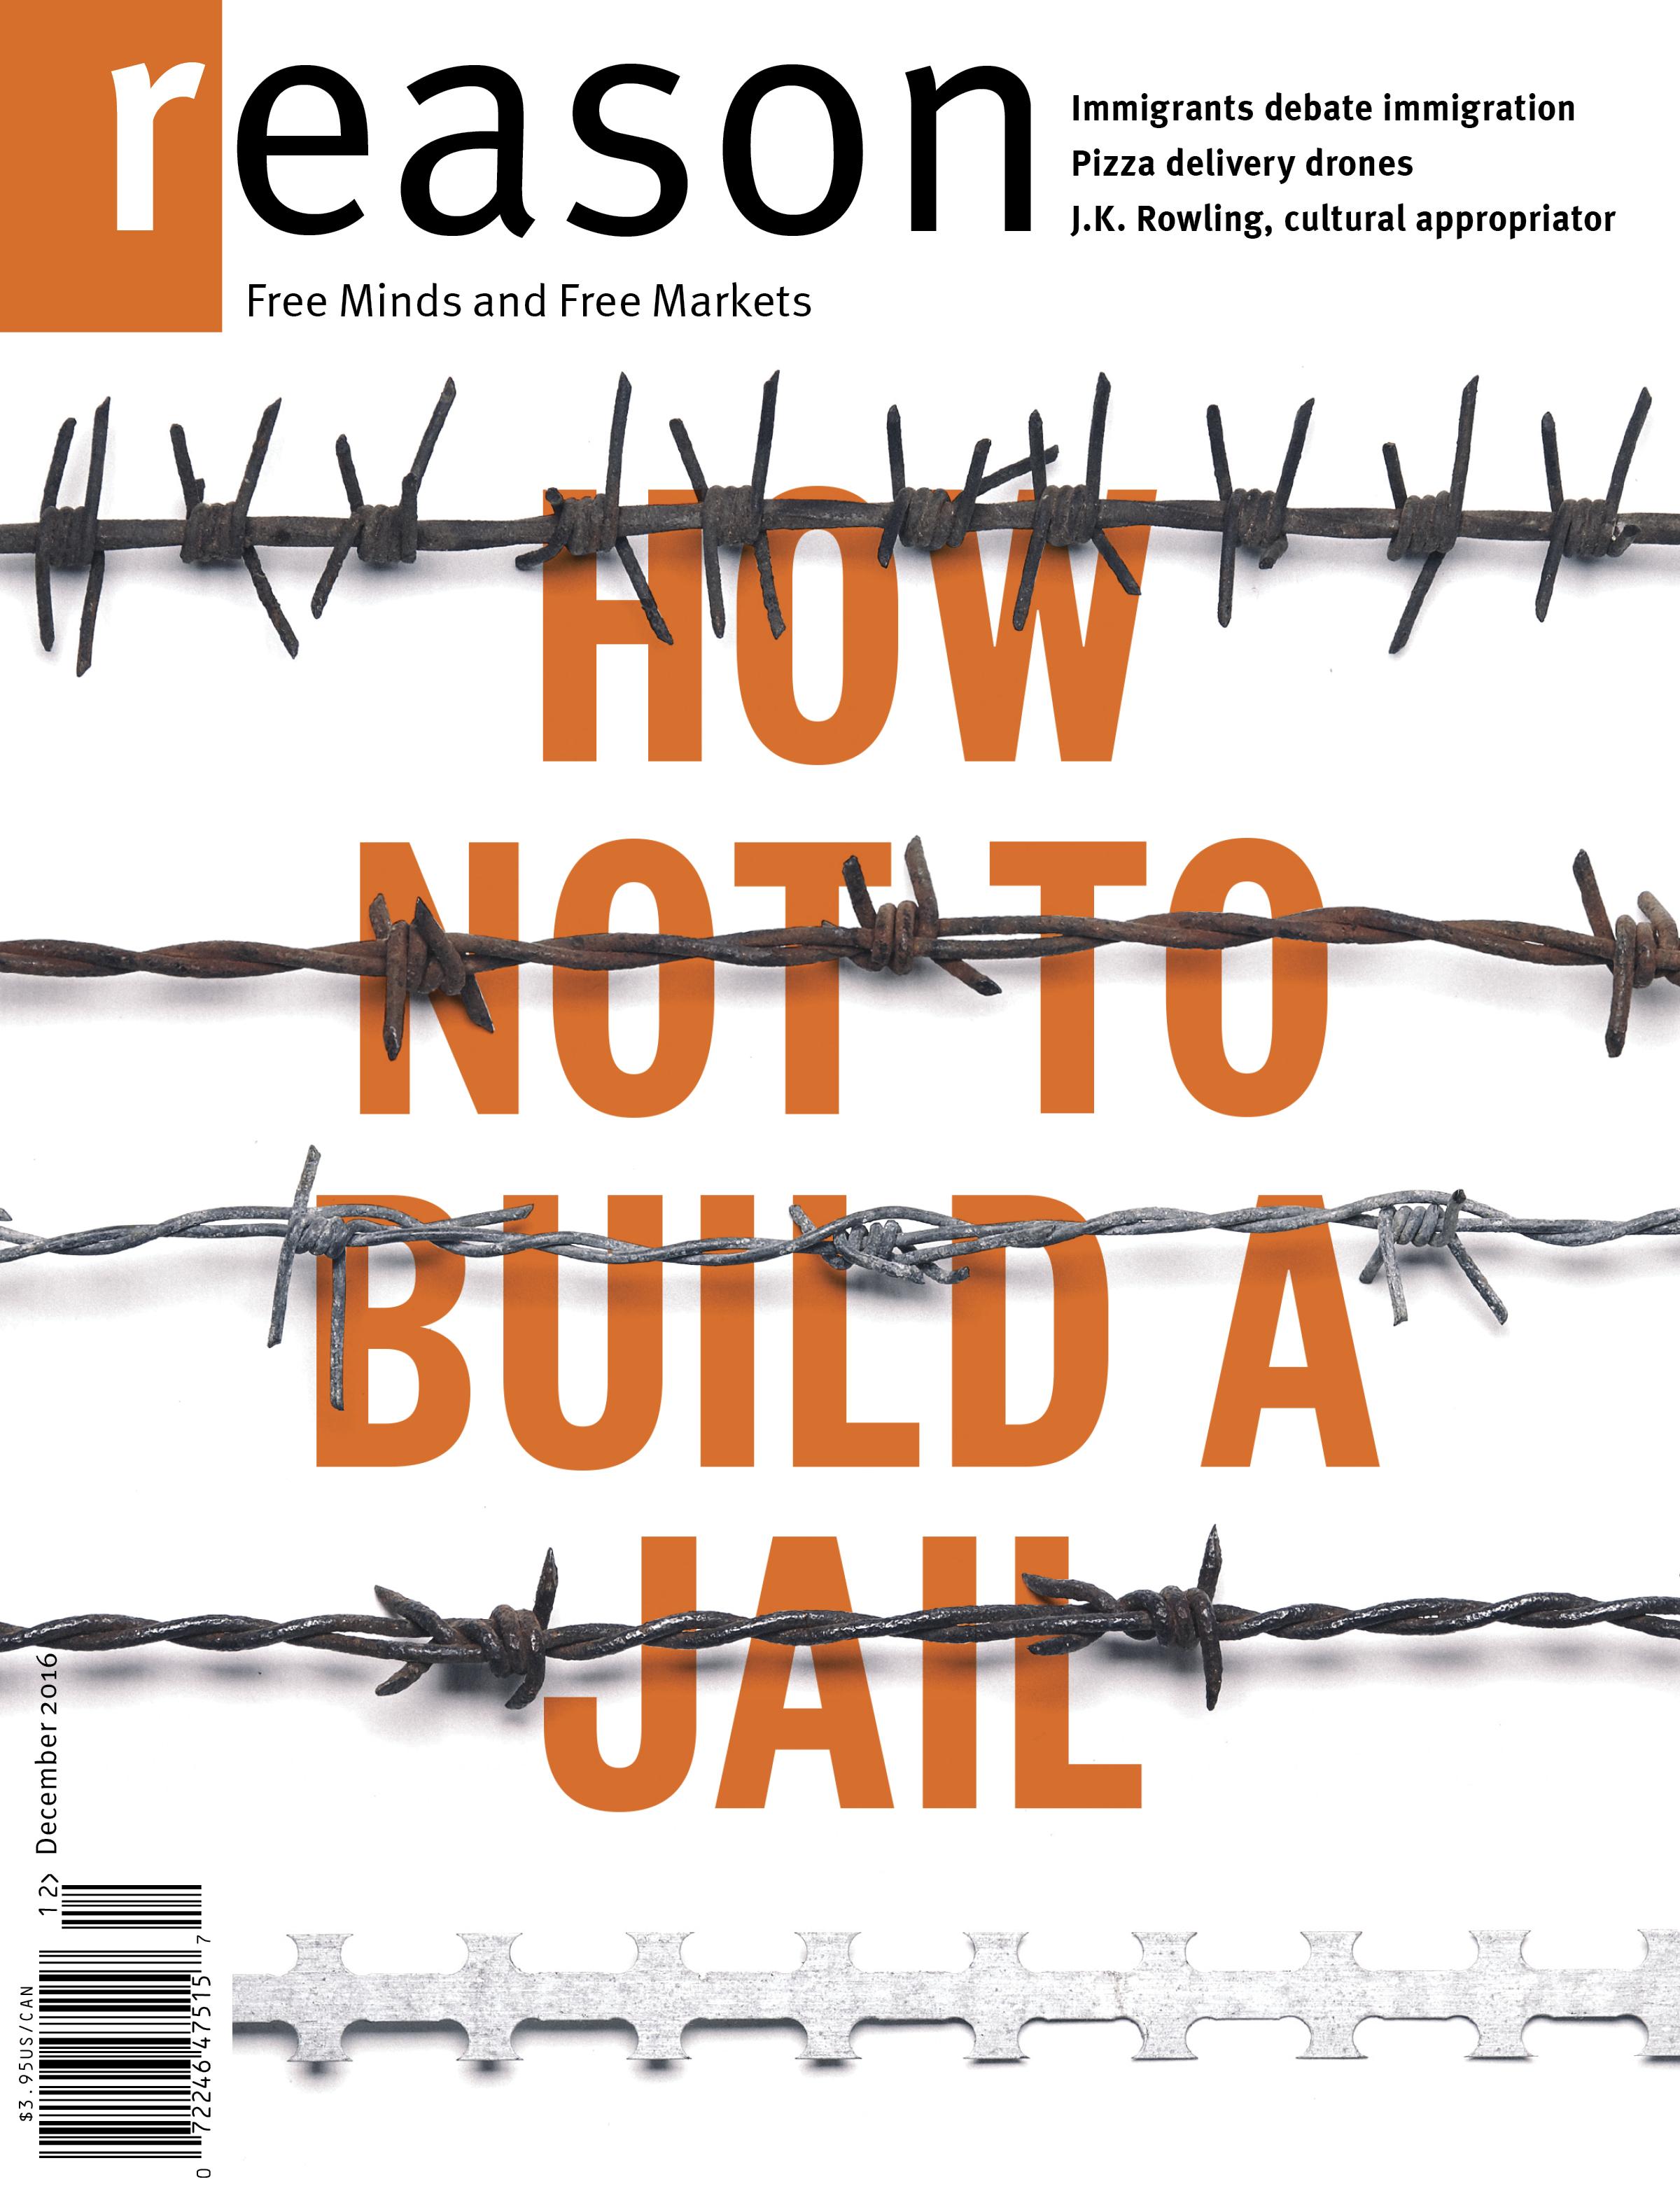 Reason Magazine, December 2016 cover image